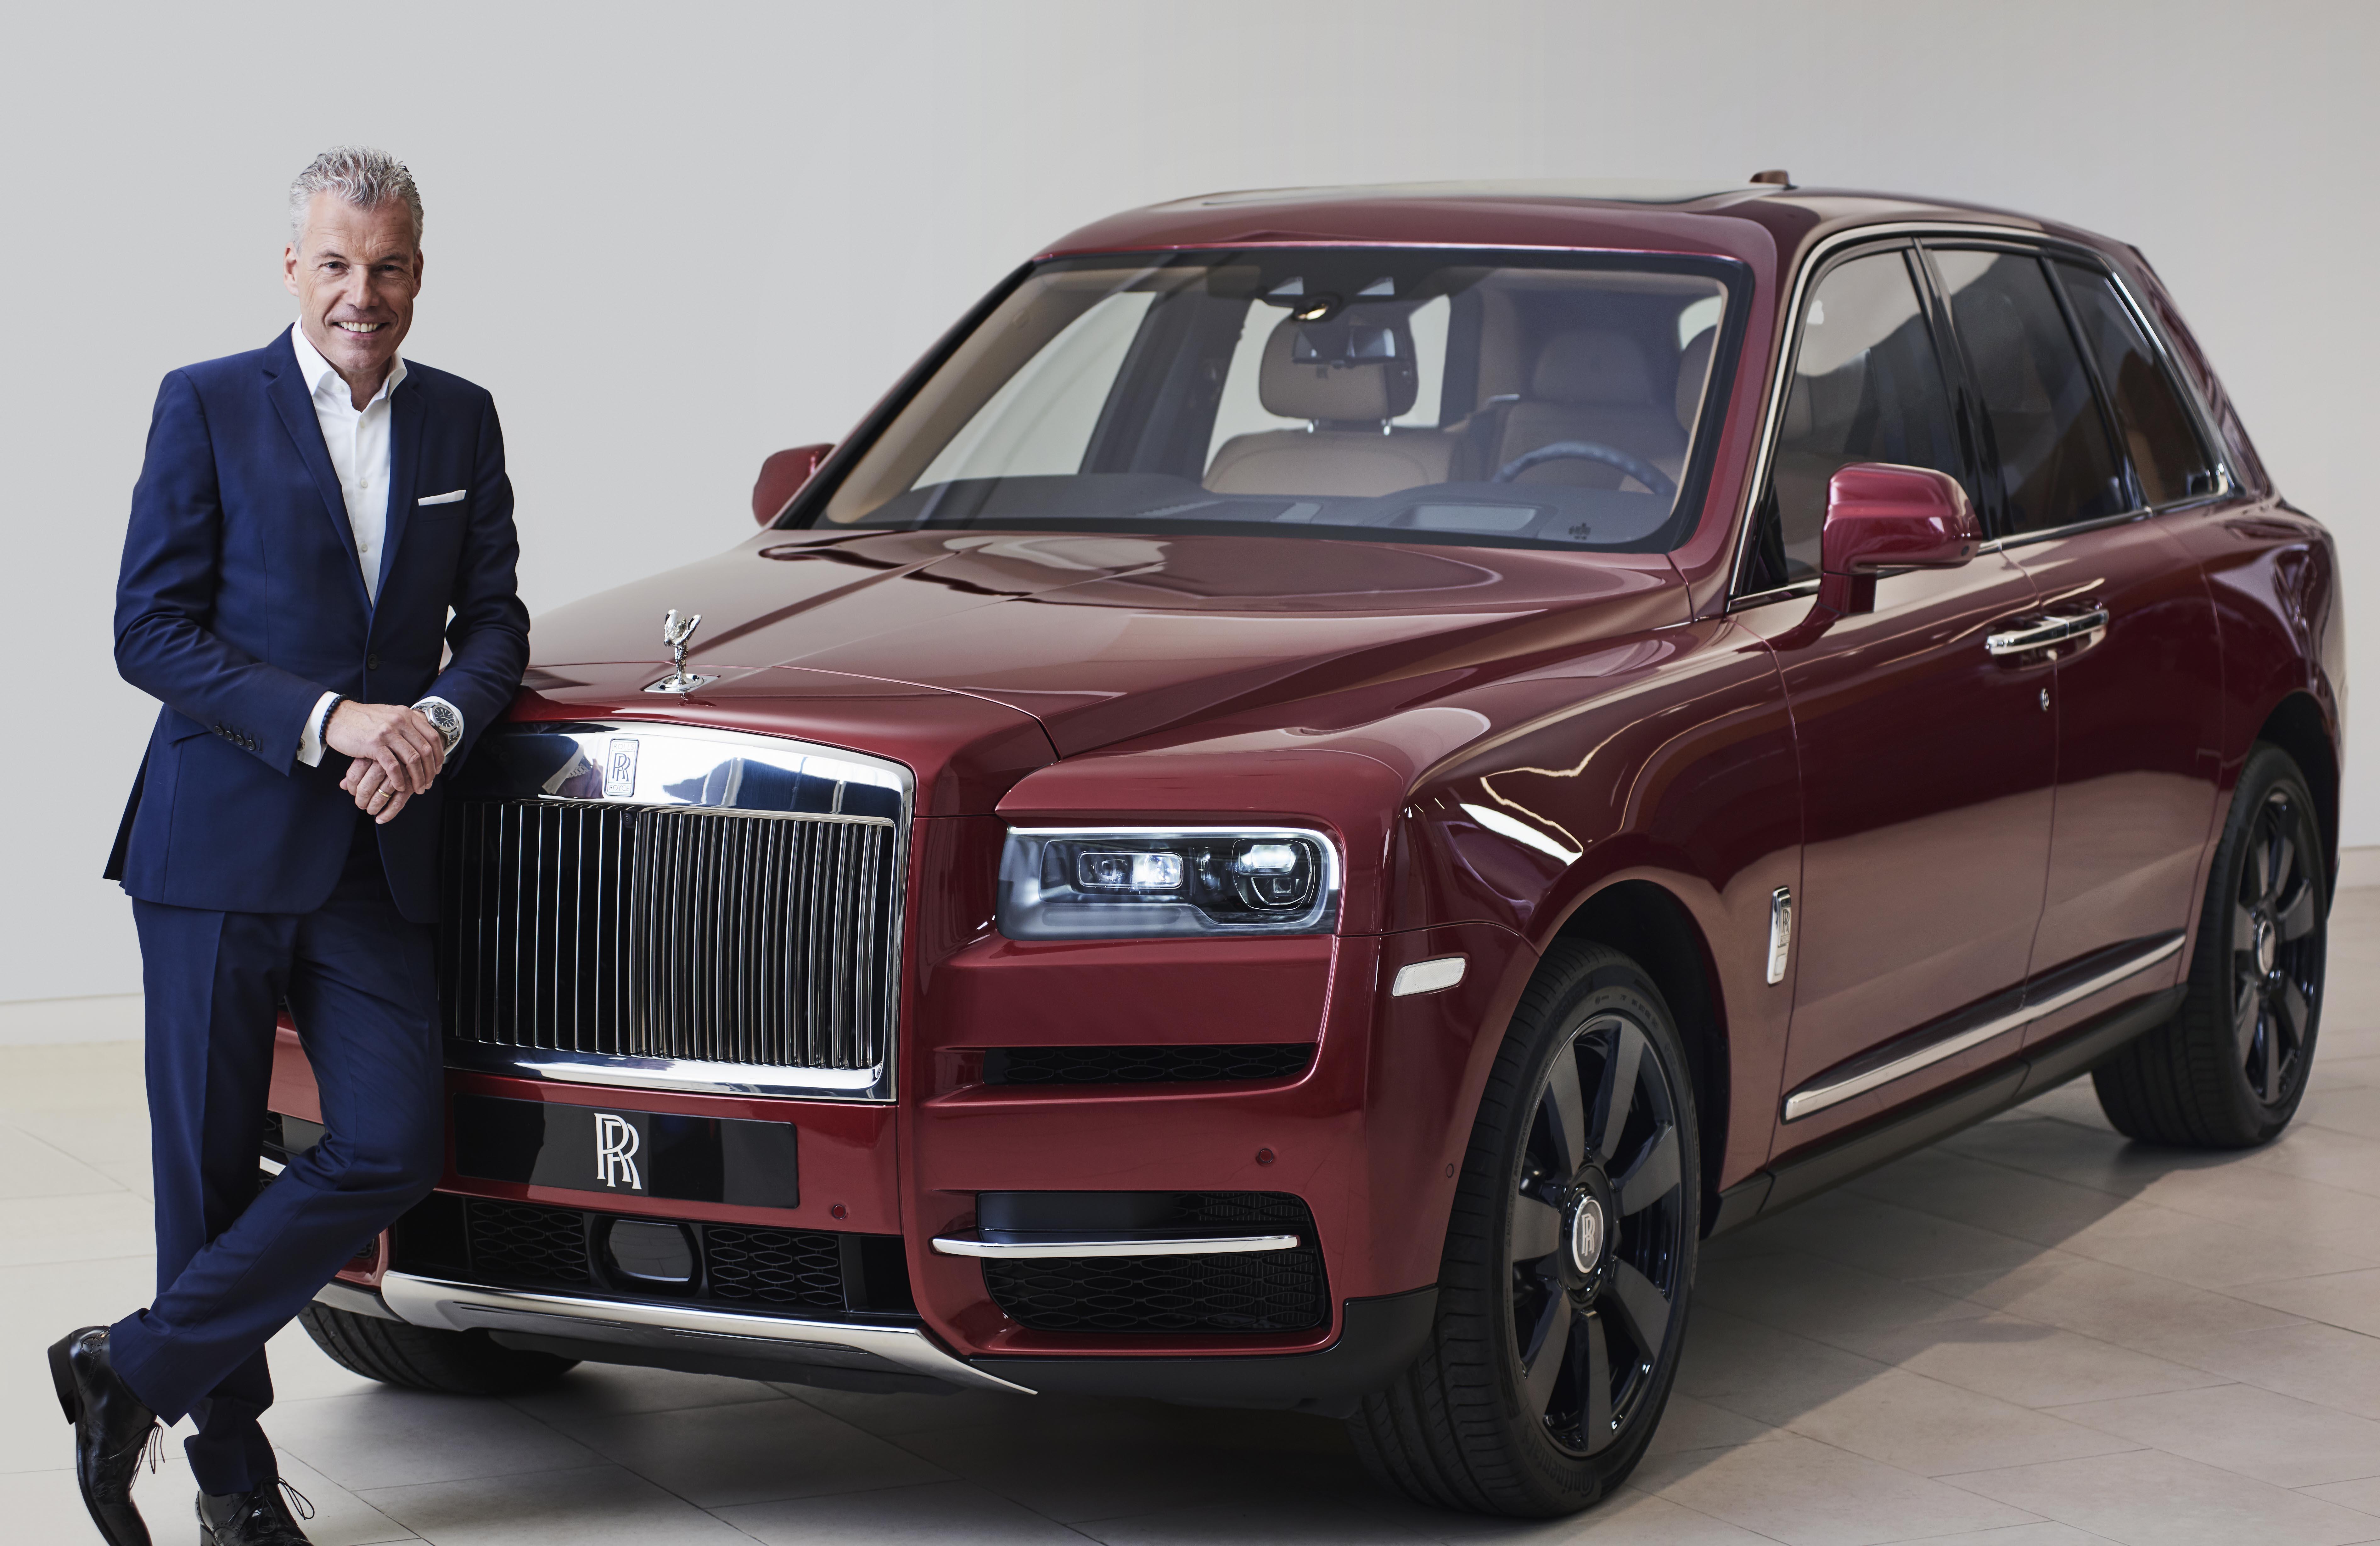 Rolls-Royce Ceo Honoured In Leading European Automotive Industry Awards